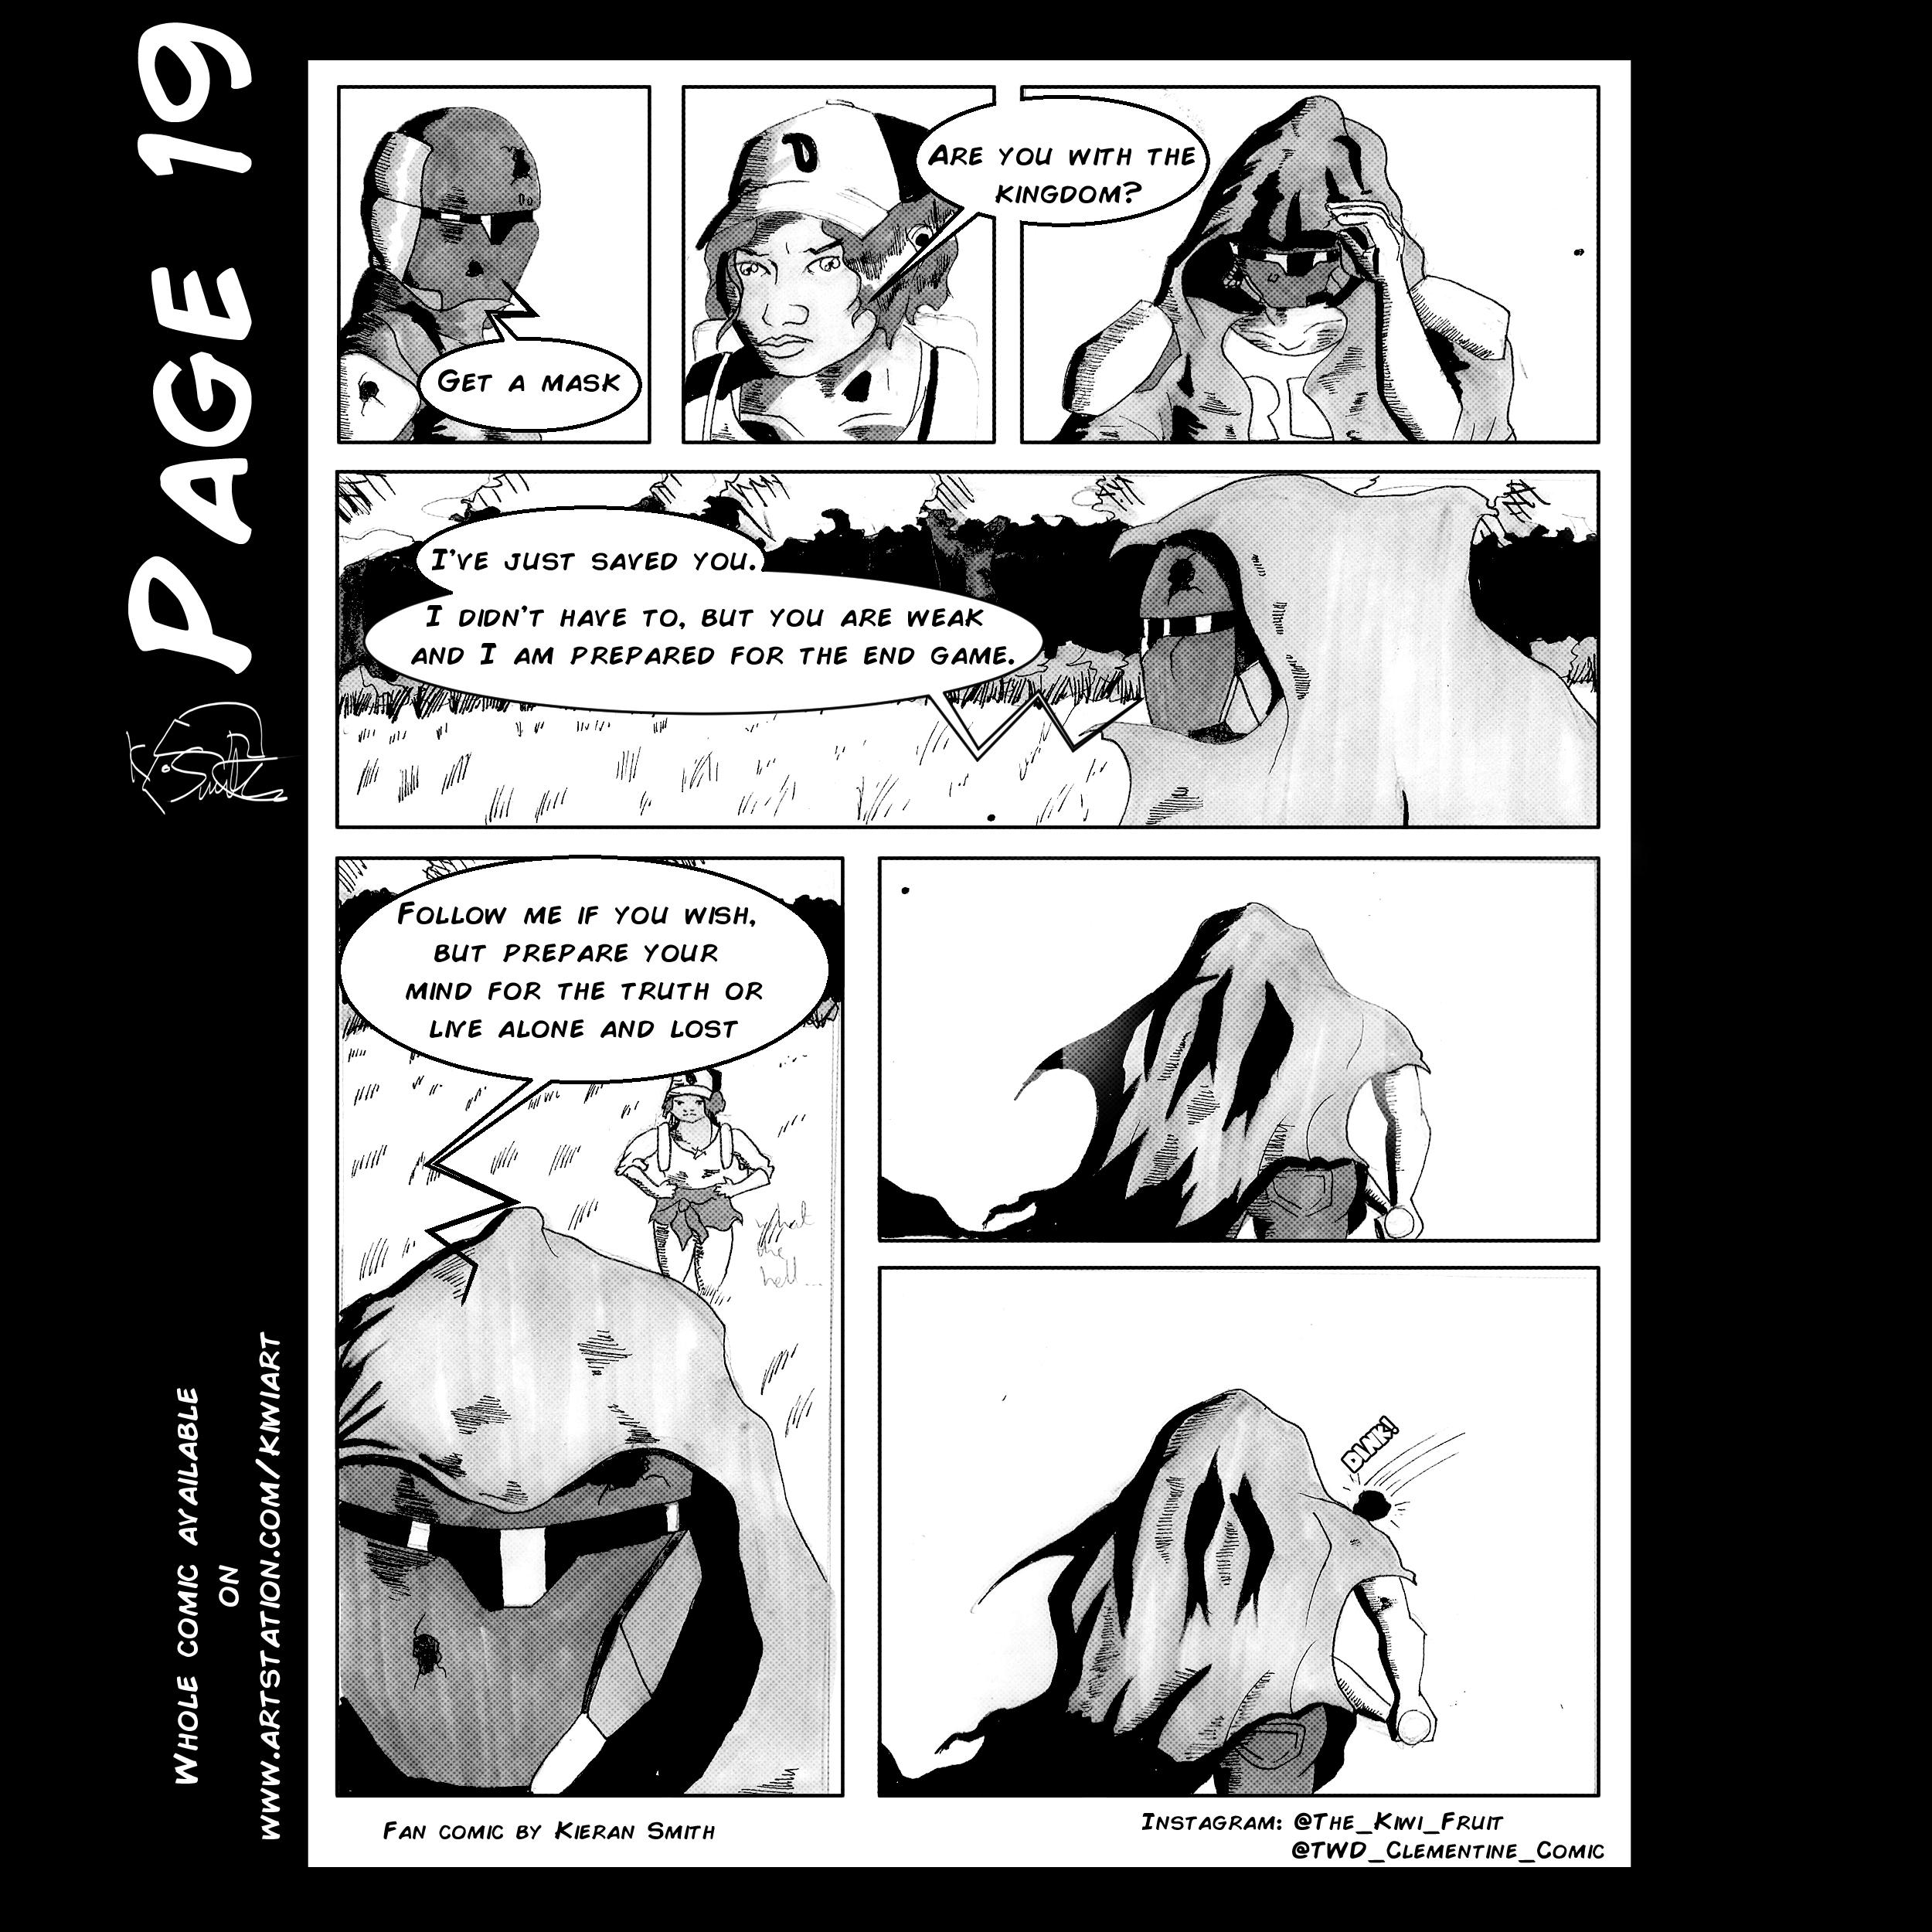 Walking Dead Clementine Page 19